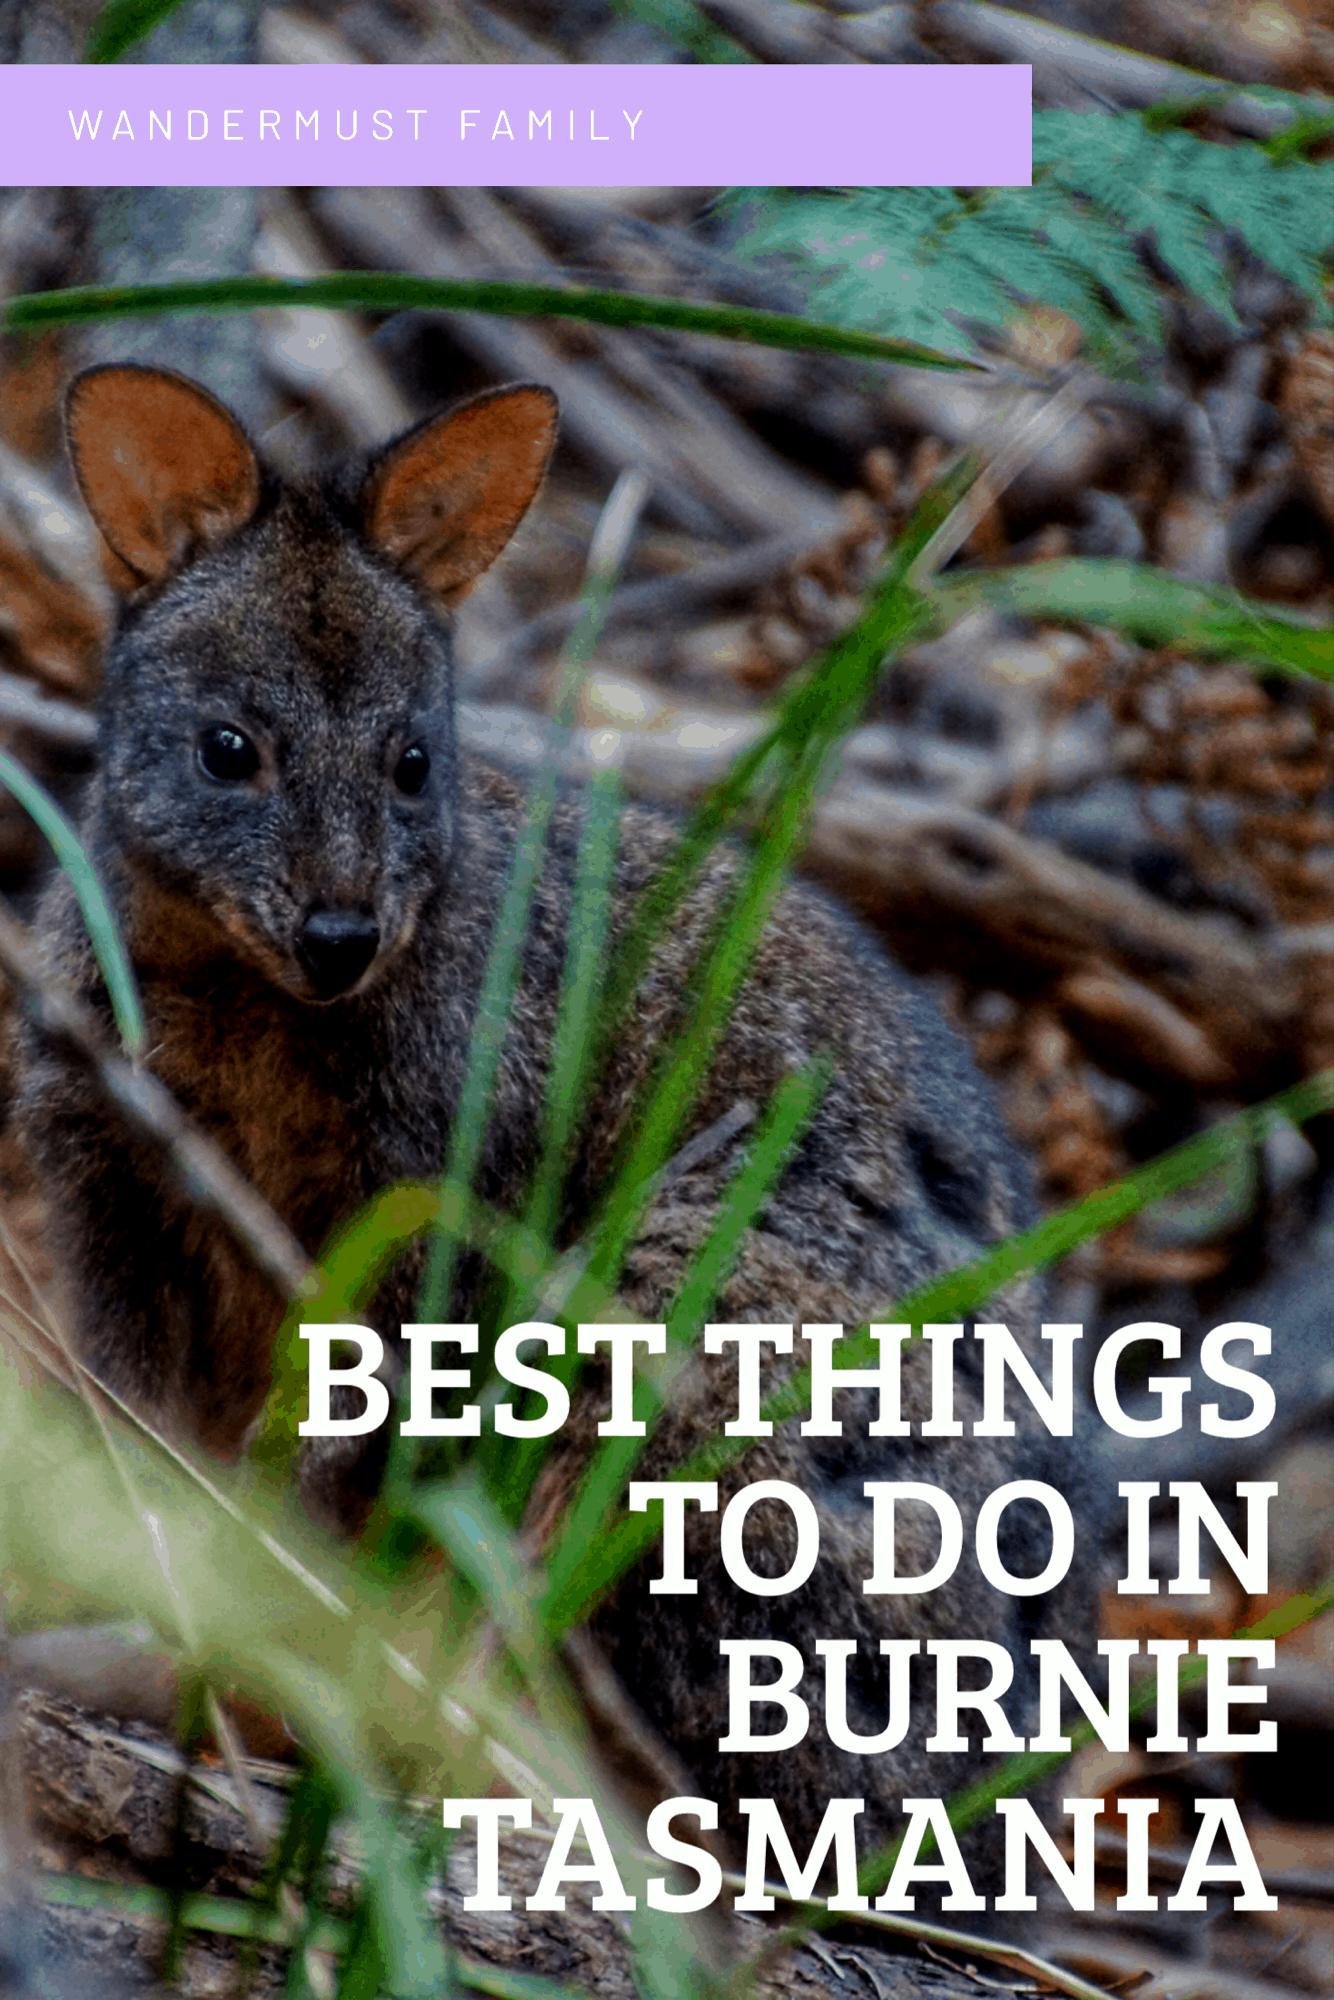 Best things to do in Burnie Tasmania including fernglade #tasmania #burnie #burnietasmania #visittasmania #tasmaniatravel #fernglade